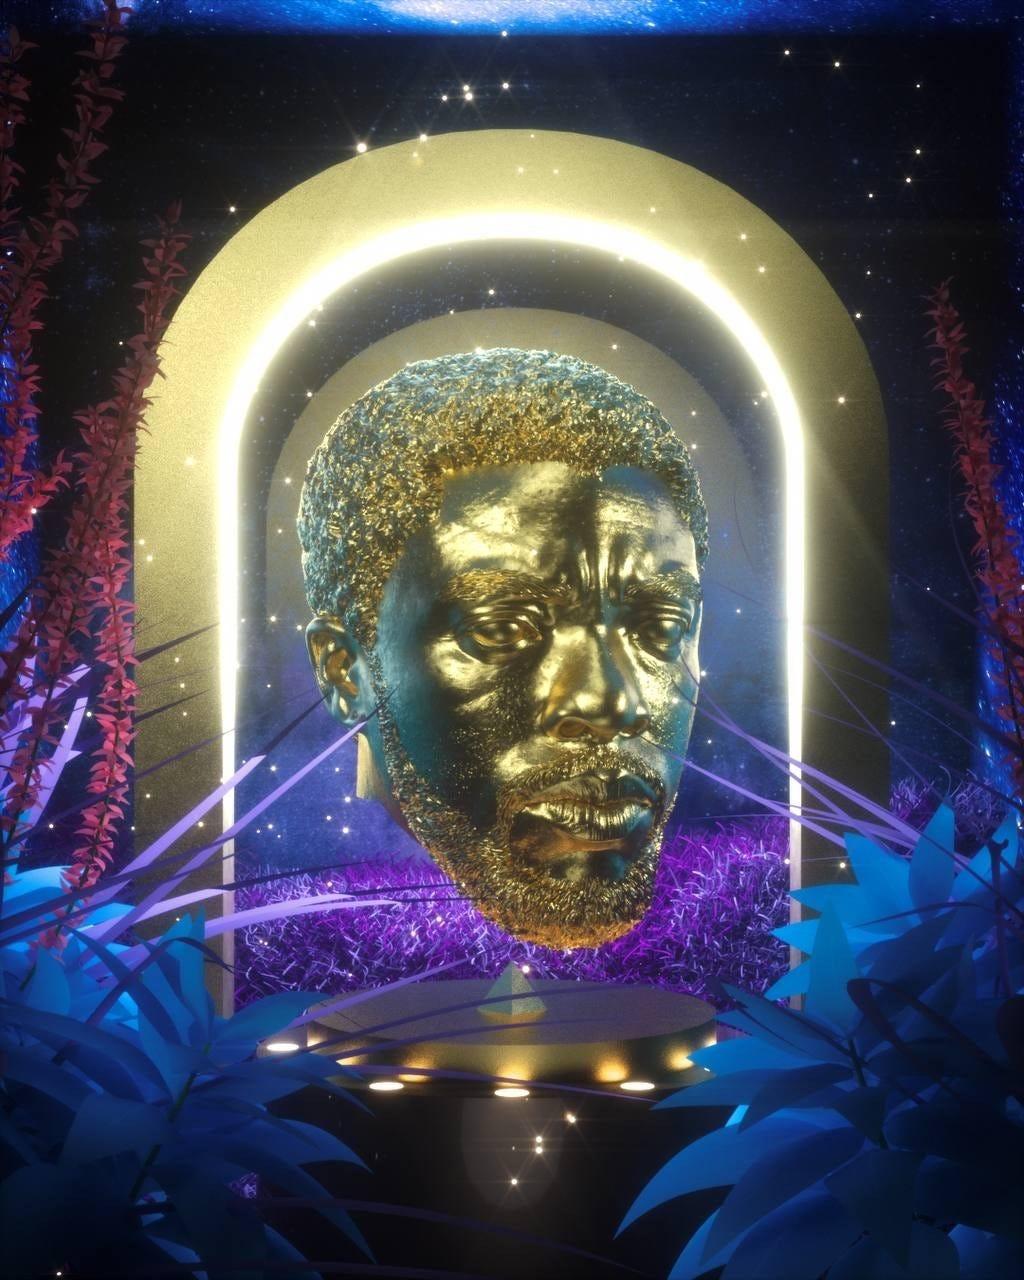 Chadwick Boseman NFTartist says he s redesigning the artwork following Oscars best-actor shocker